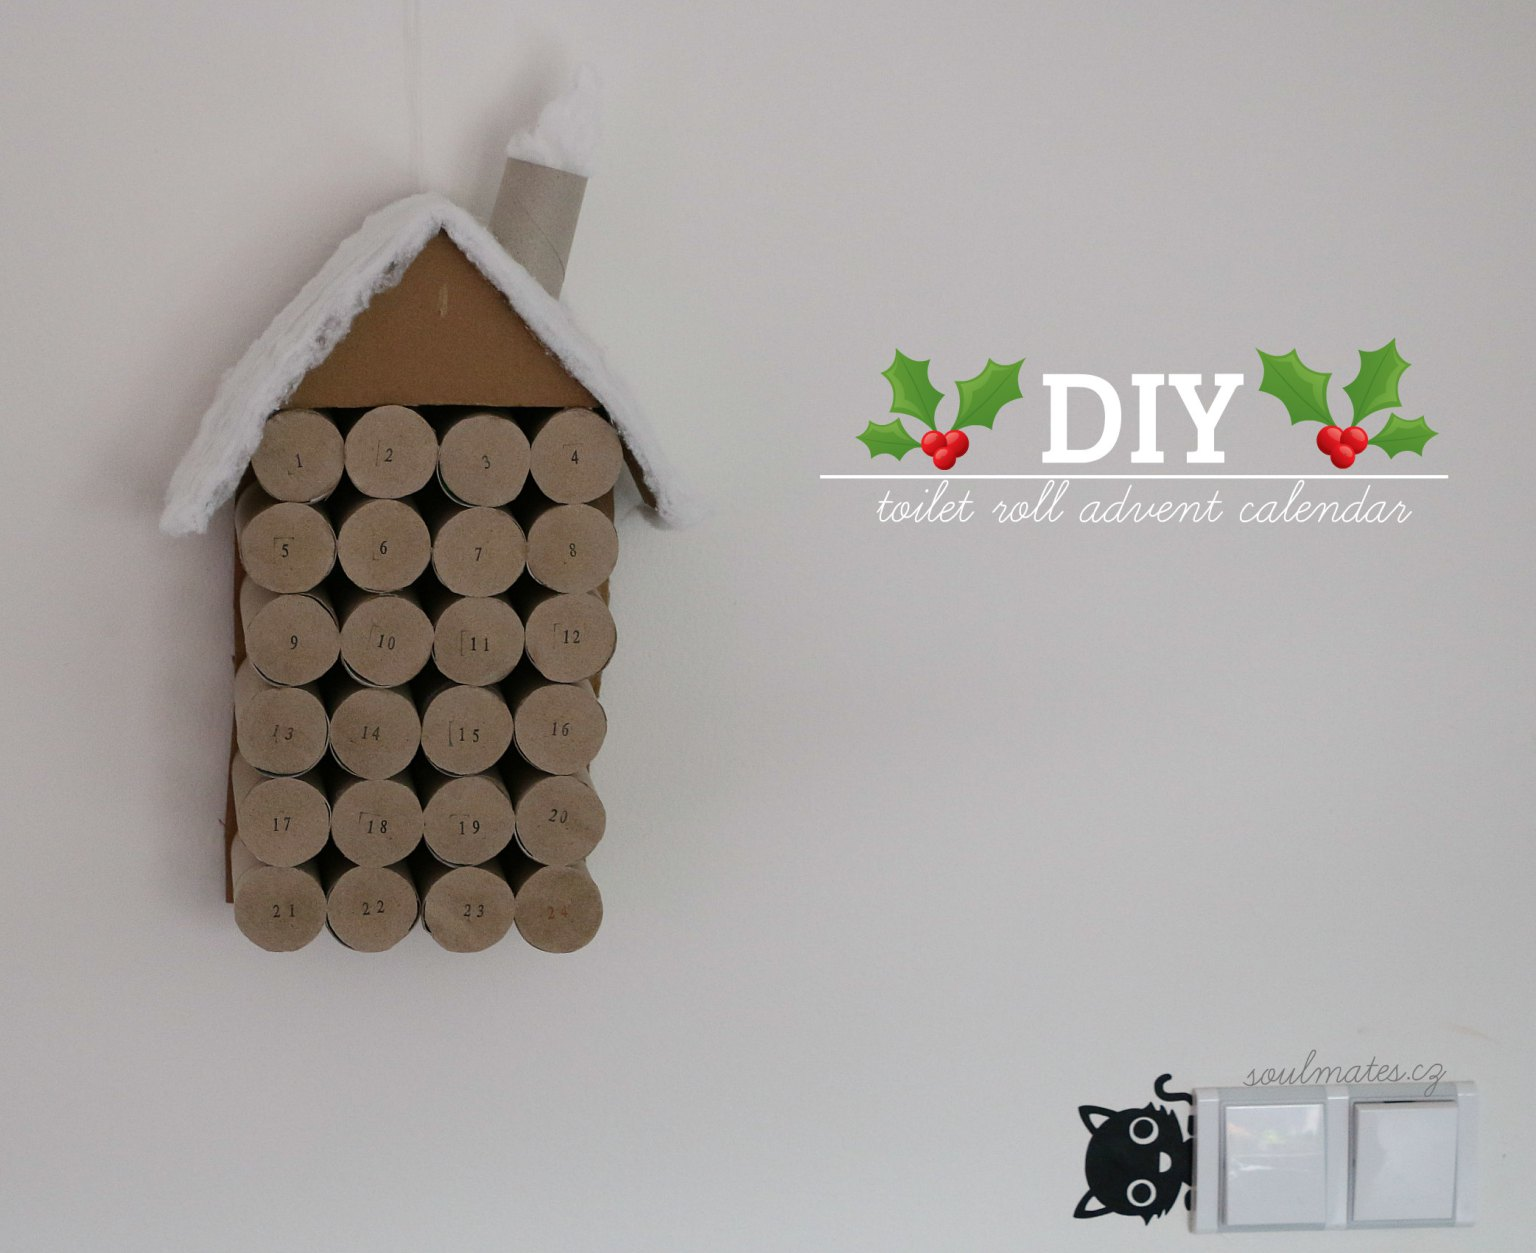 adventni kalendar diy DIY: Adventní kalendář   Nicole adventni kalendar diy